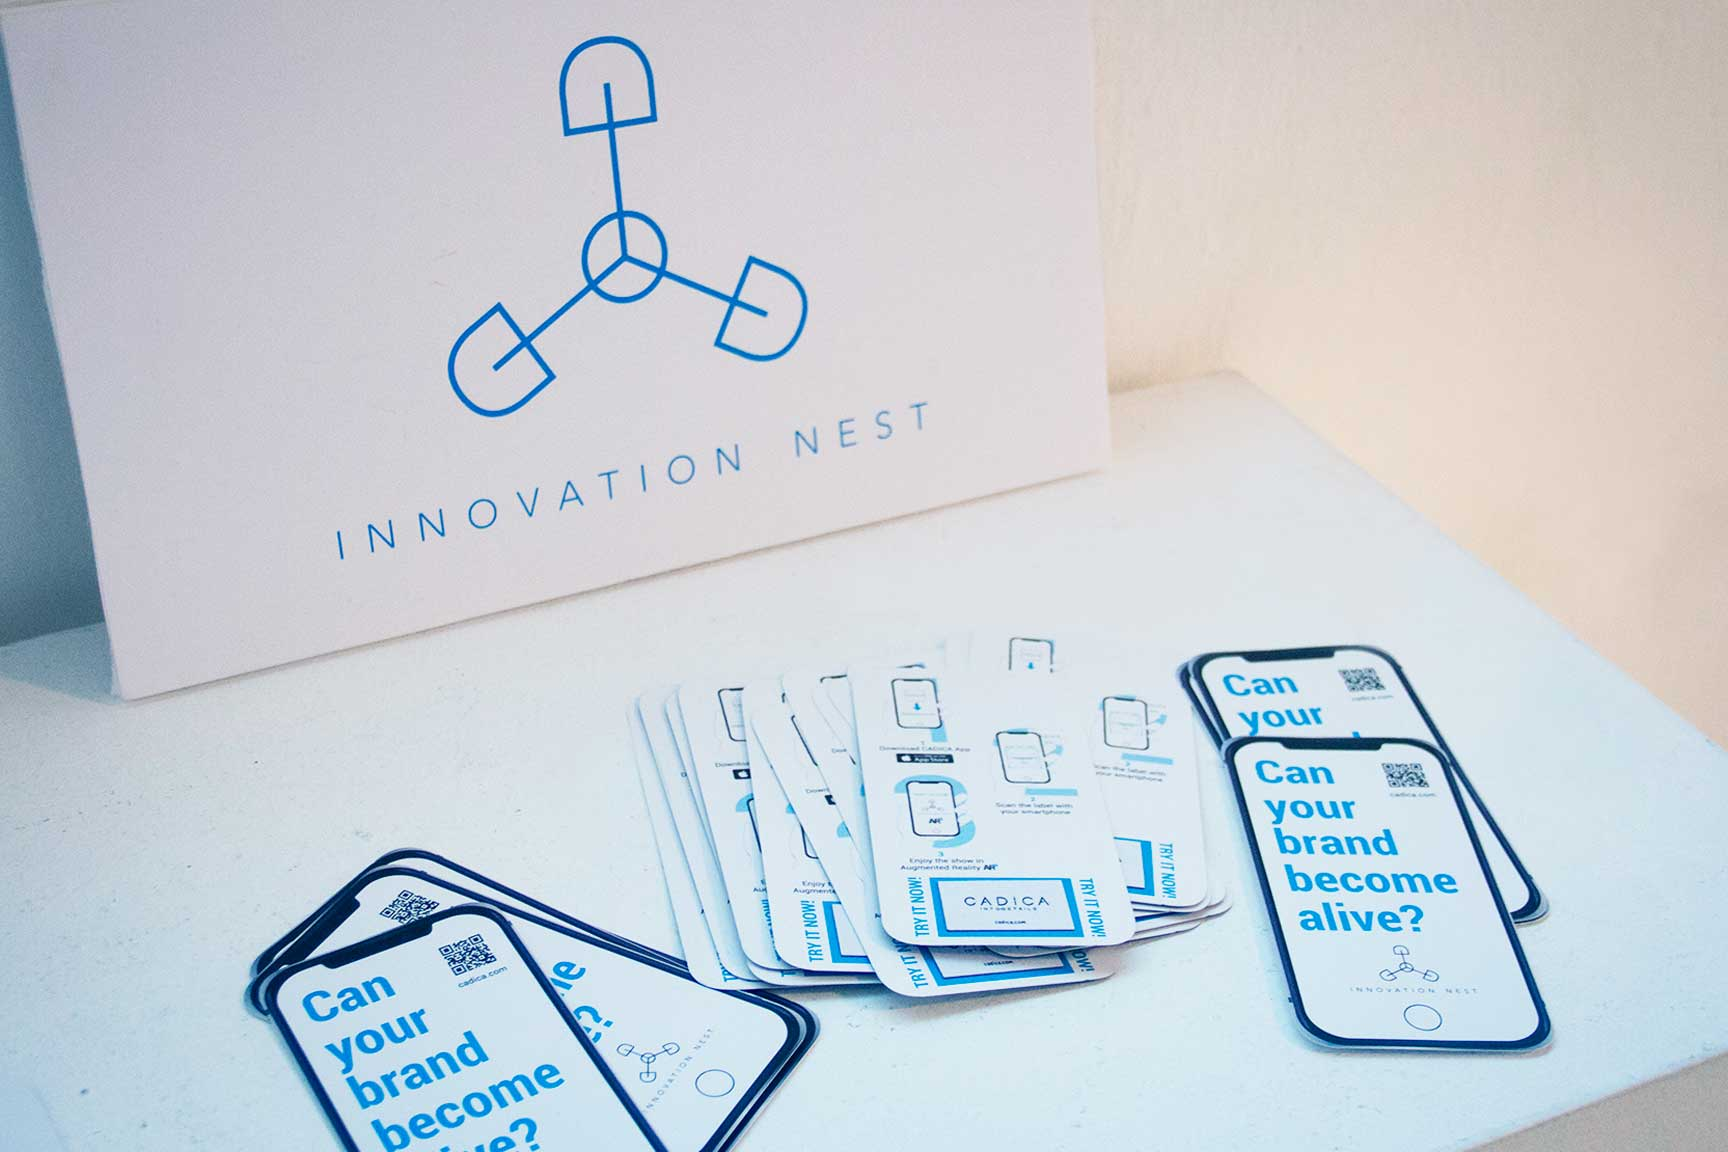 cadica_innovation_nest04